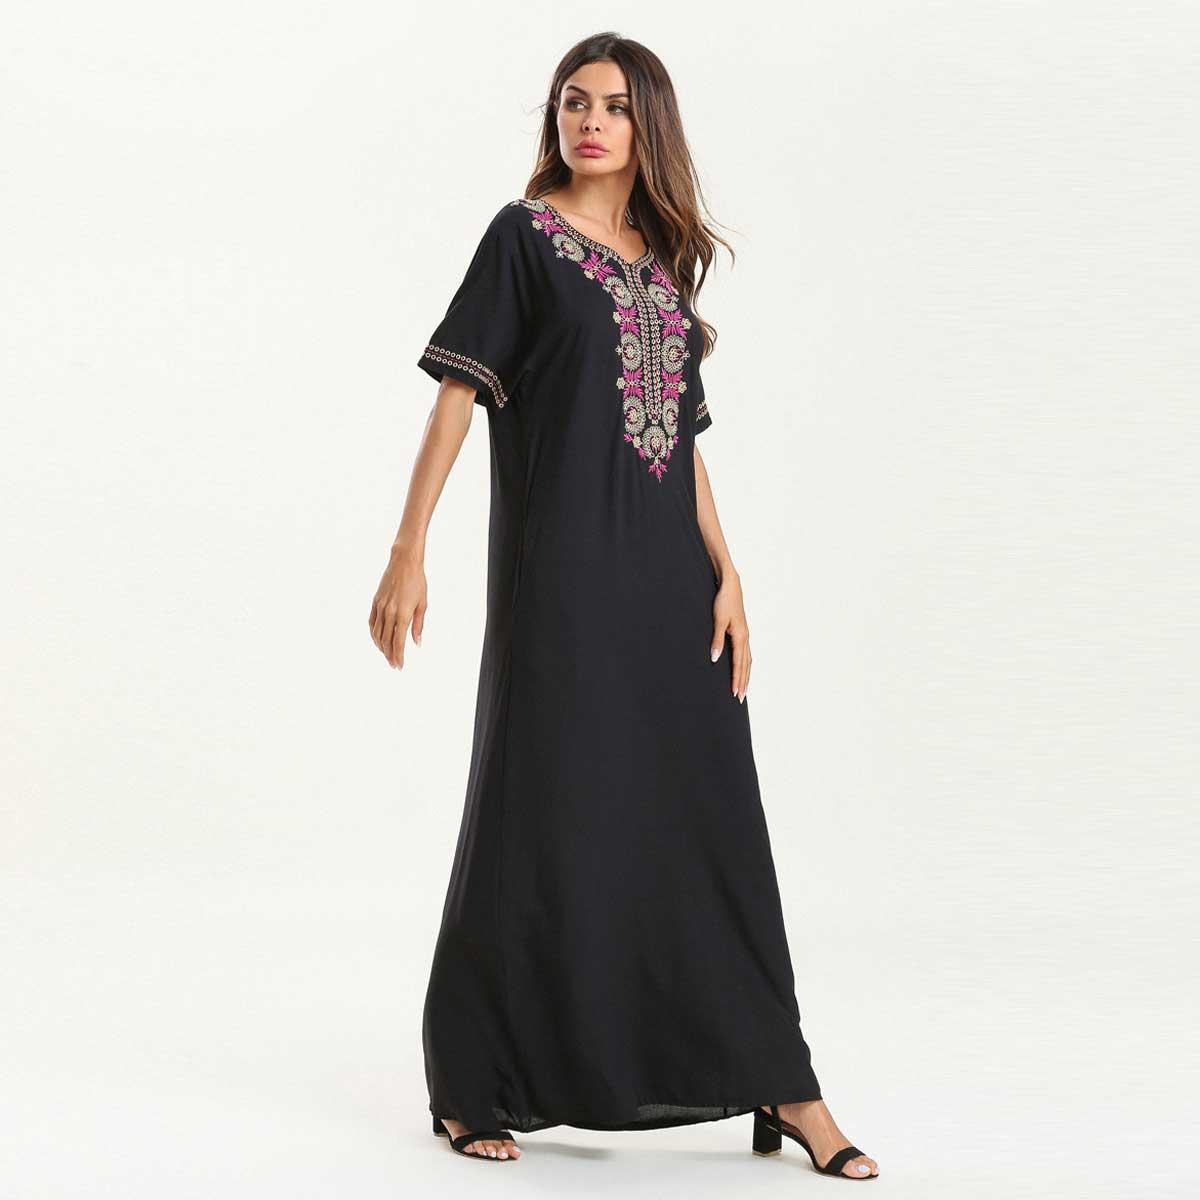 Women Summer Maxi Dress Short Sleeve Embroidery Ethnic Muslim Abaya Dubai Kaftan Islamic Arabic Ramadan Robe Fashion VKDR1524-in Islamic Clothing from Novelty & Special Use on Aliexpress.com | Alibaba Group